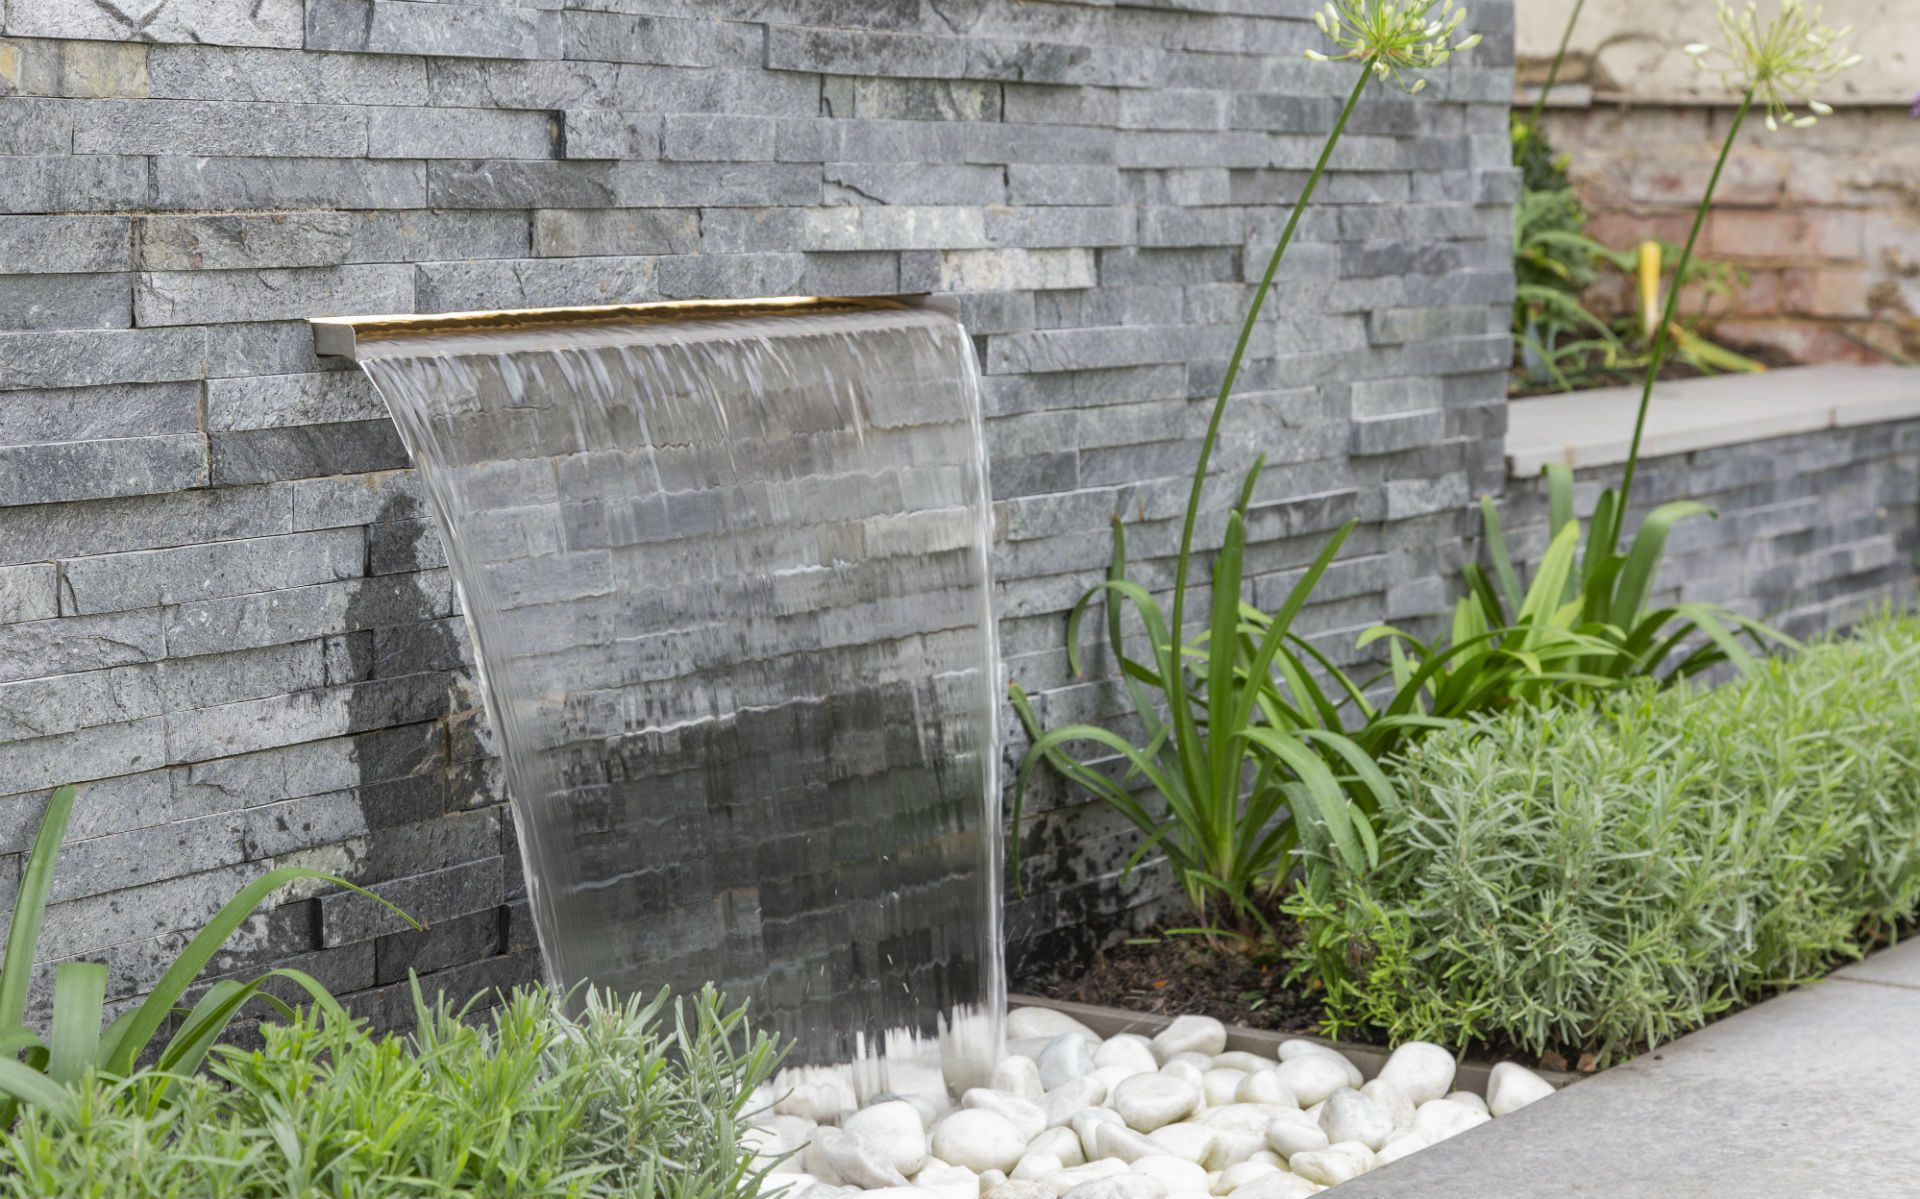 Small Quayside Garden Water Blade Feature Split face Slate Feature Wall Maldon Essex